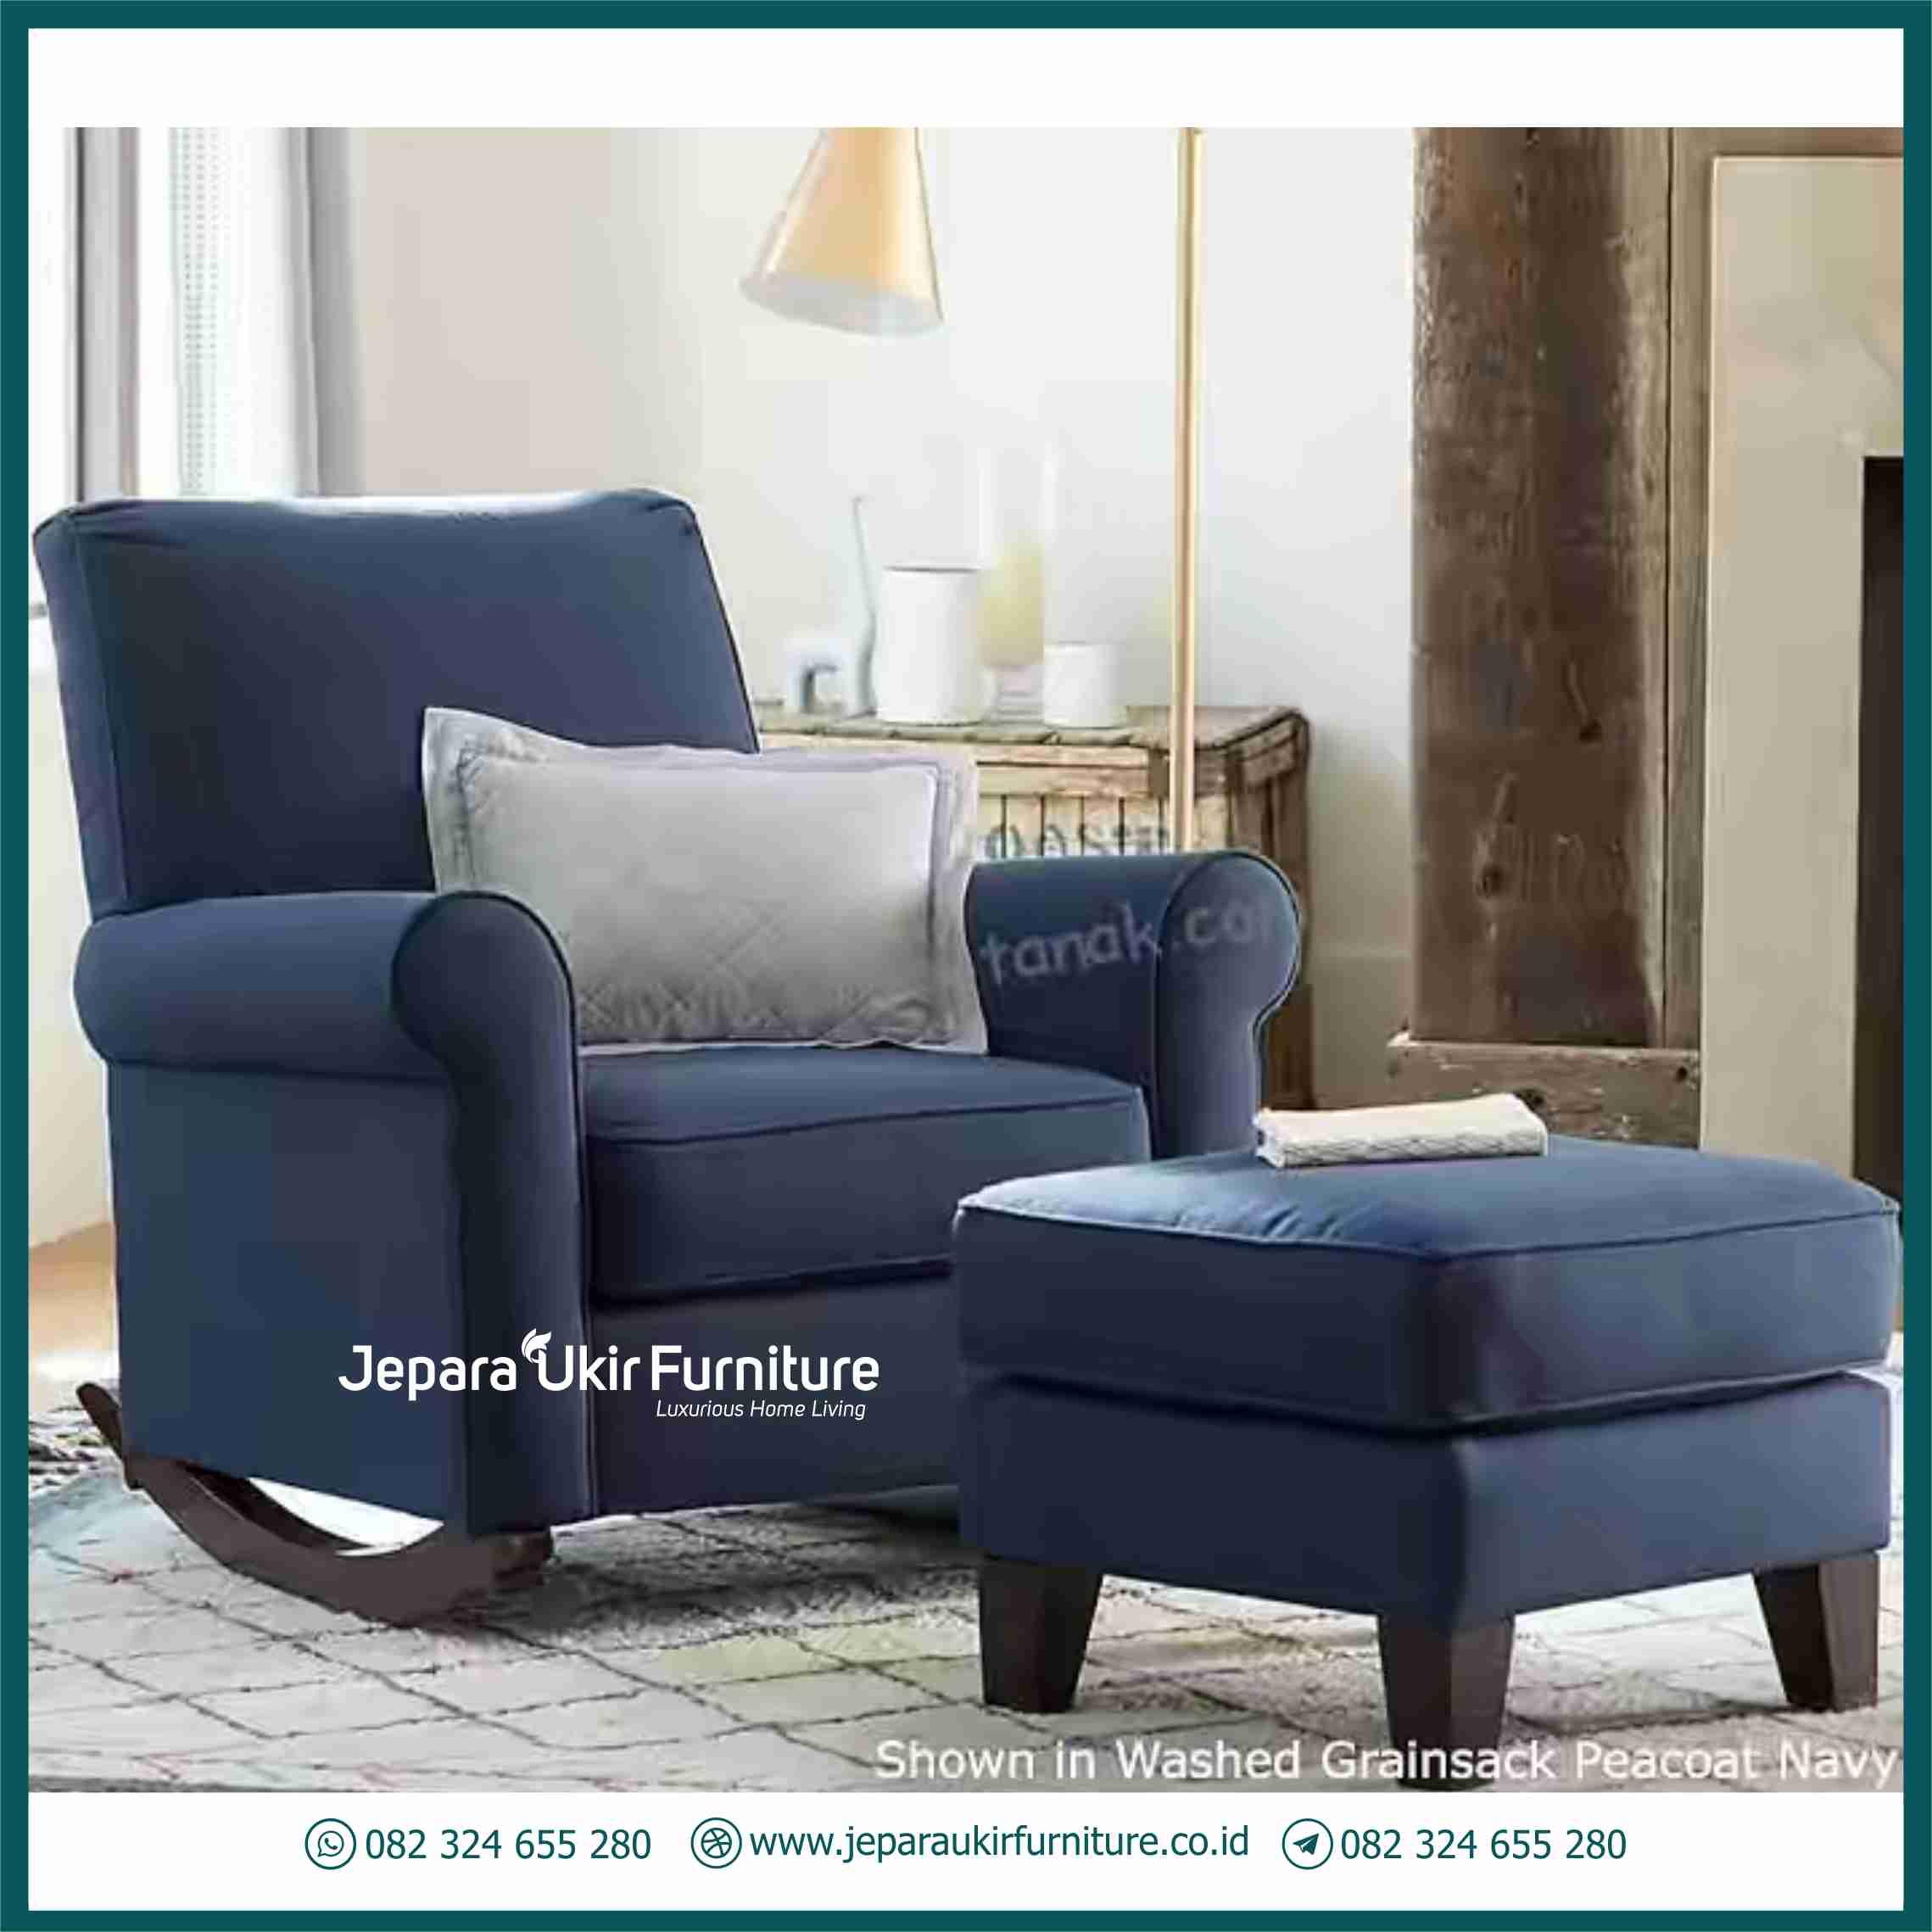 Sofa menyusui, Sofa retro model L, Sofa retro, sofa retro, sofa kekinian, sofa scandinavian, sofa retro murah, sofa terbaru, kursi retro, sofa bangku retro, sofa bangku, sofa 3 dudukan, sofa 3 seater, sofa chester, sofa chesterfield.